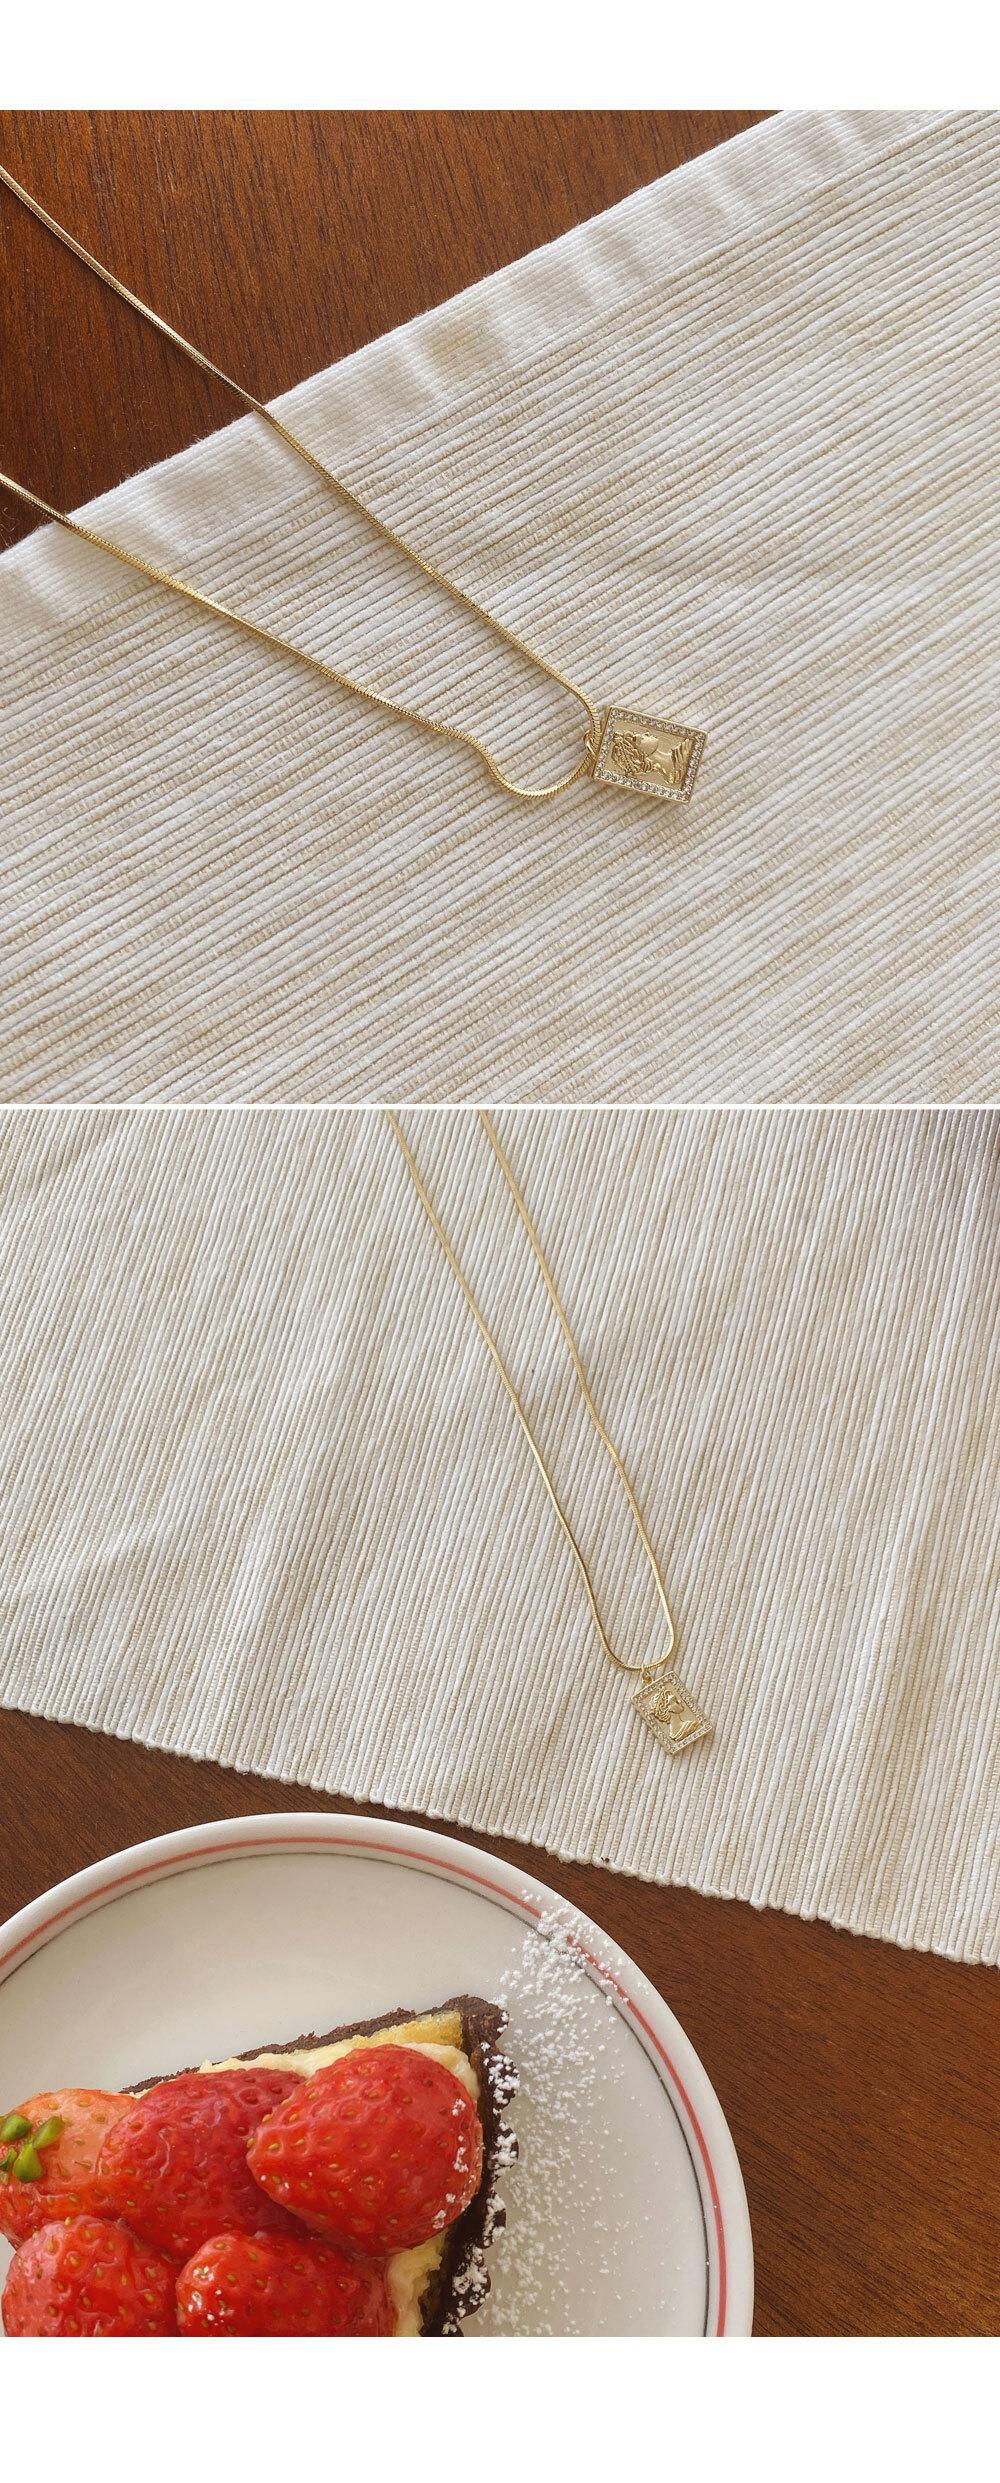 Luxurious pendant necklace